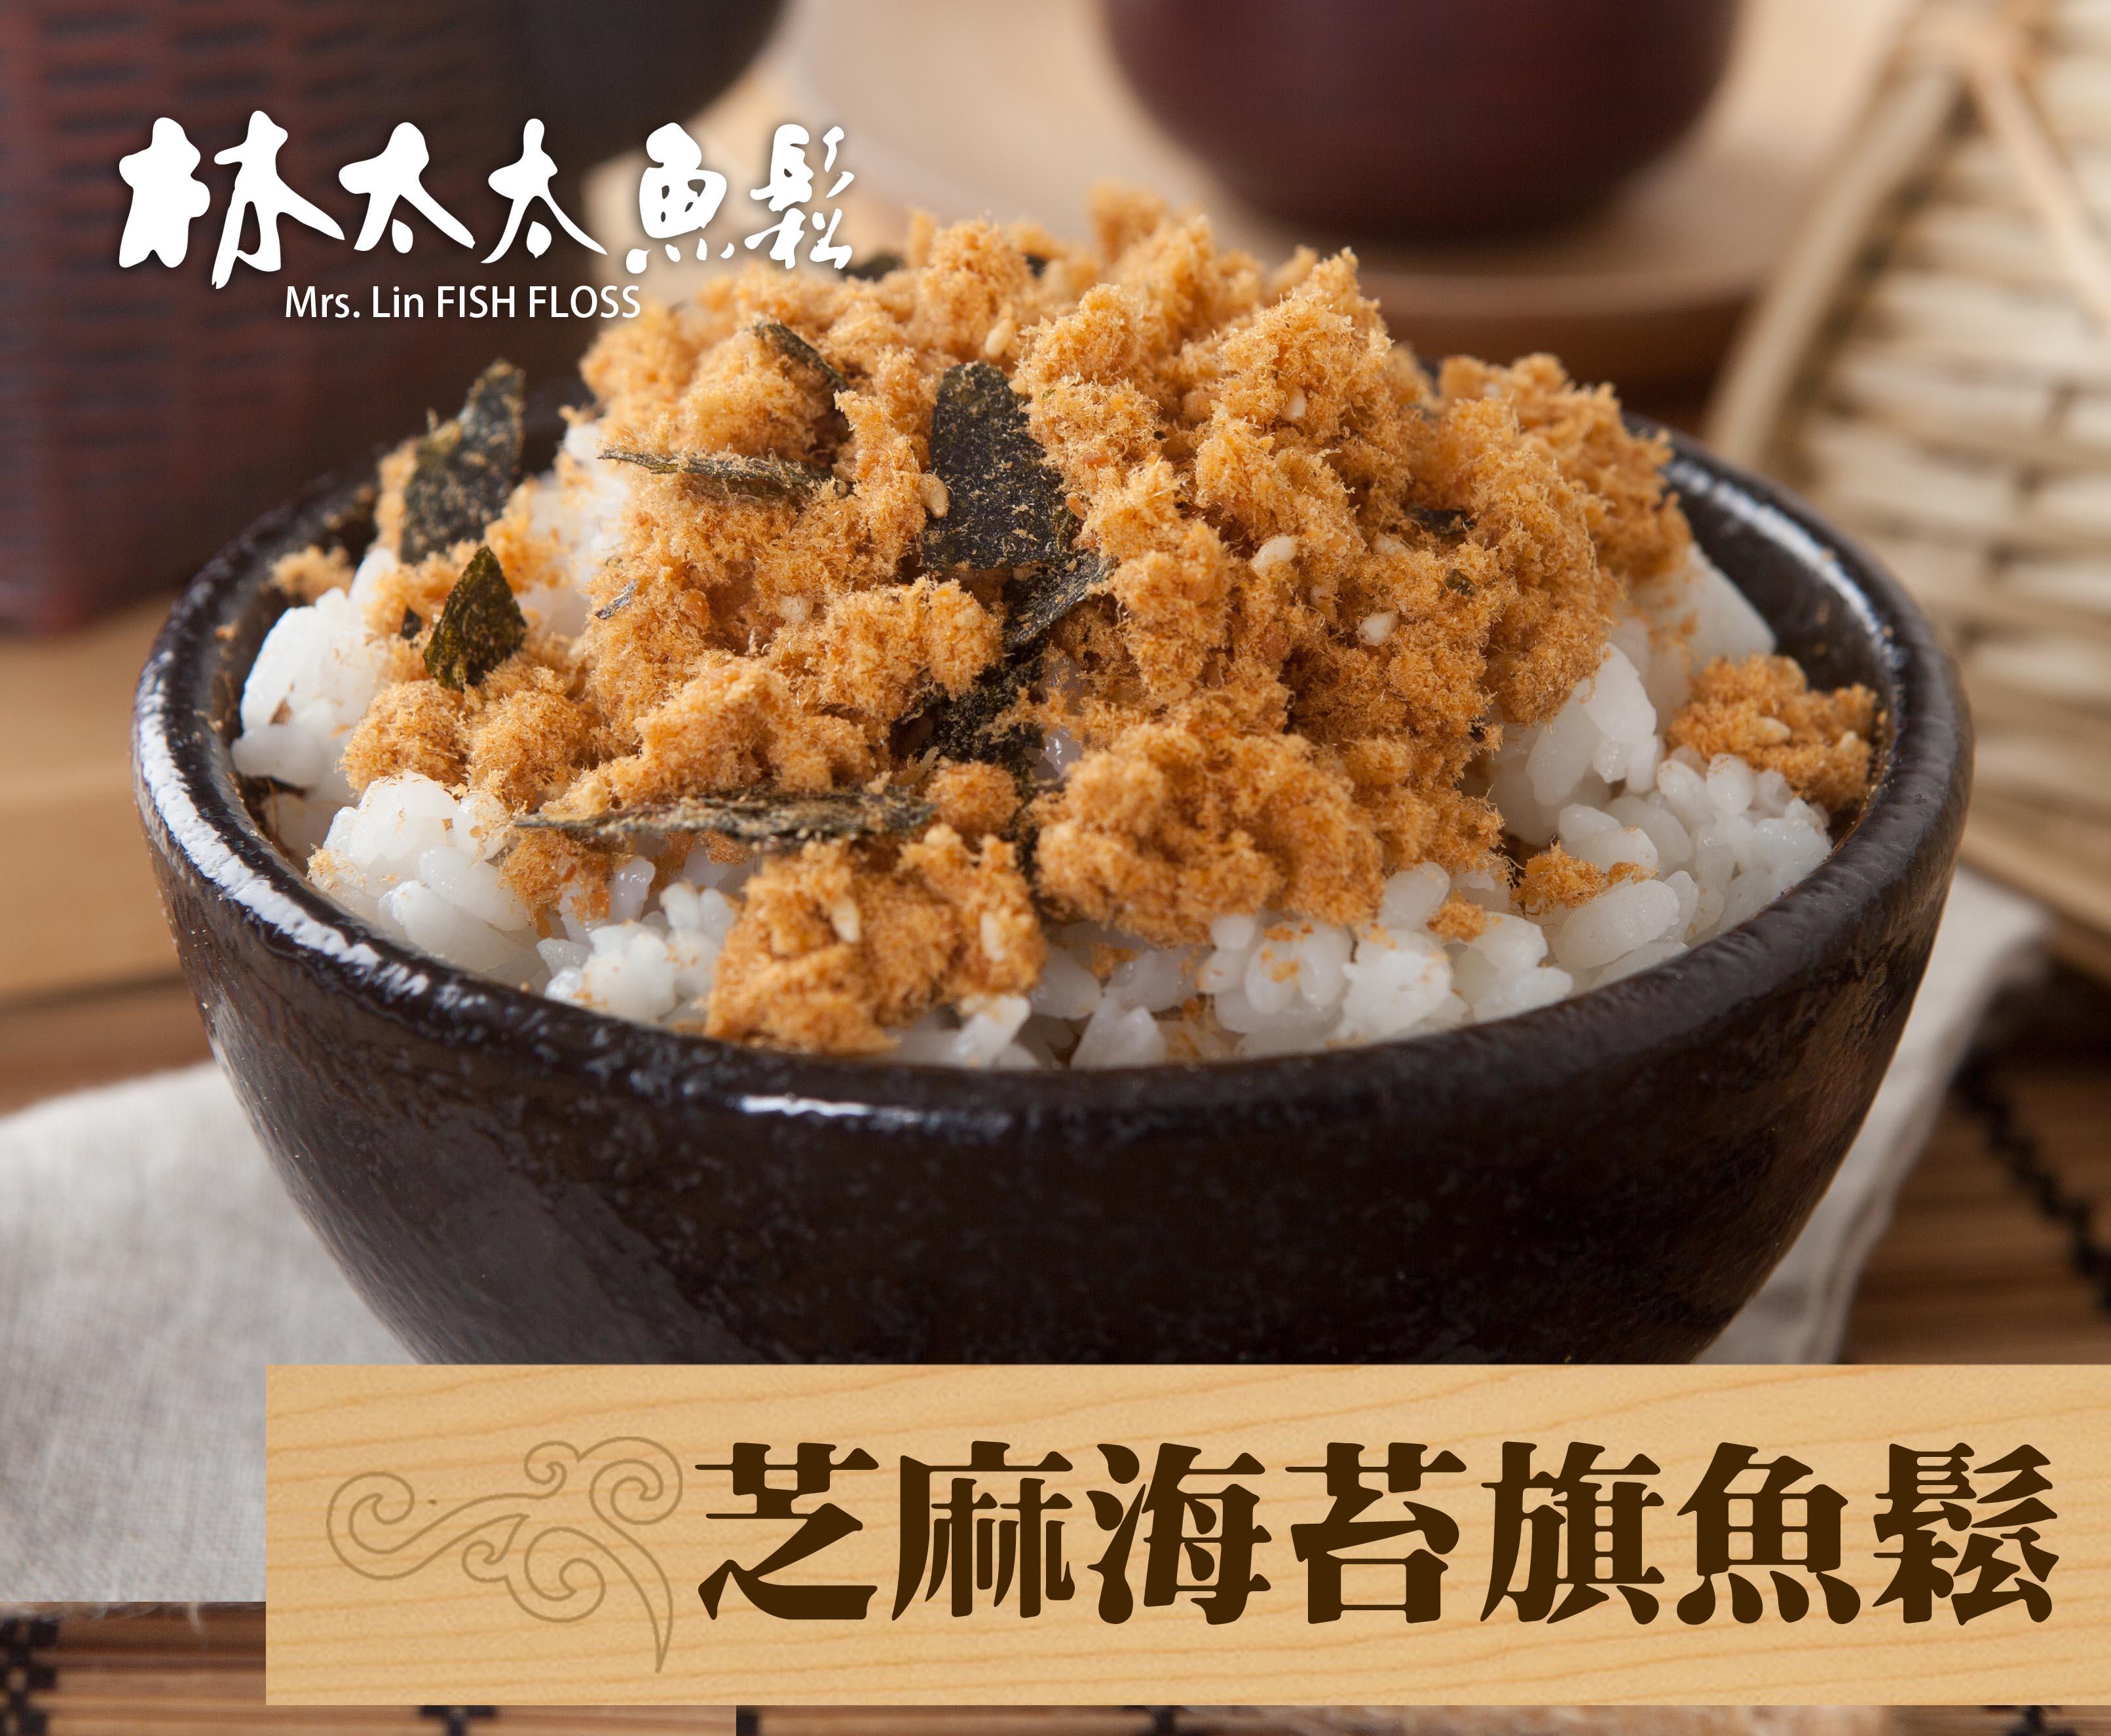 <br/><br/>  芝麻海苔旗魚魚鬆 300g 林太太魚鬆專賣店<br/><br/>